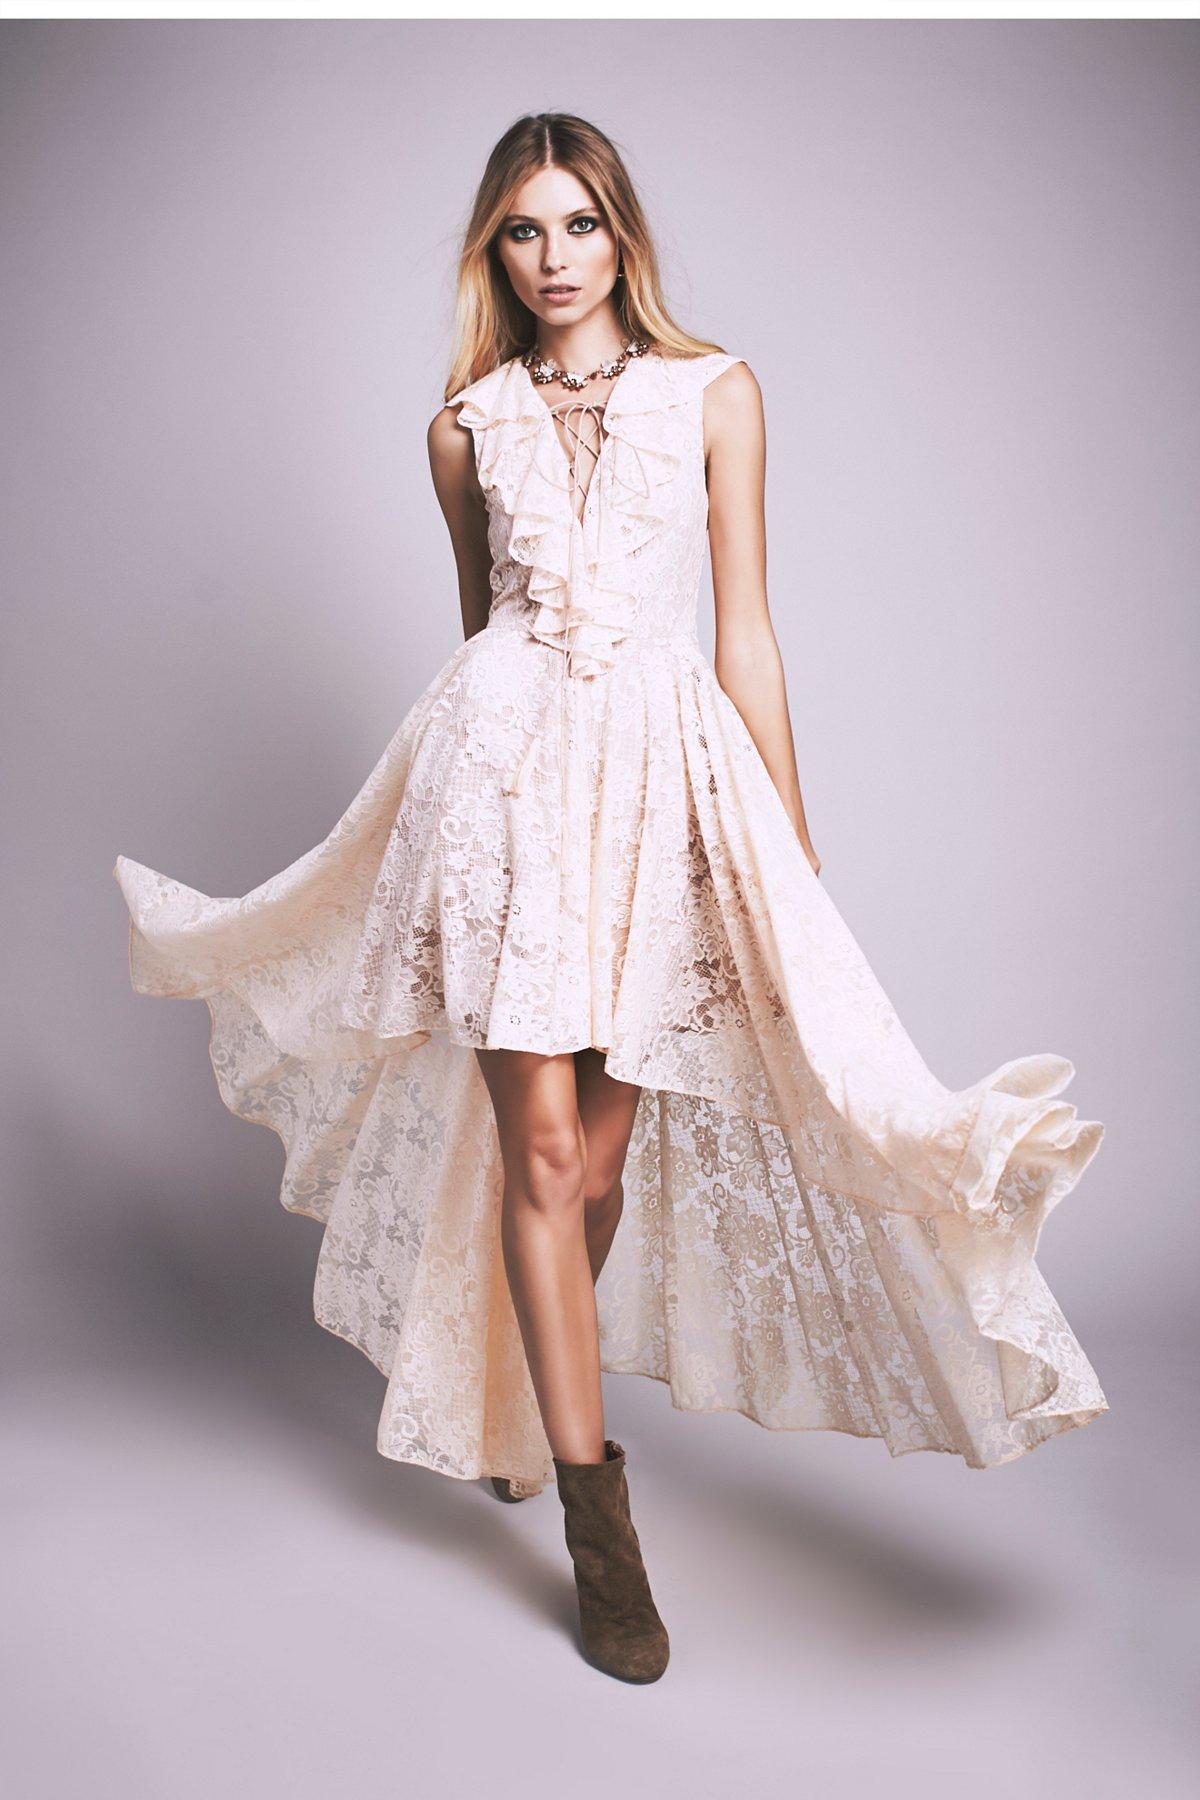 Goddess蕾丝连衣裙